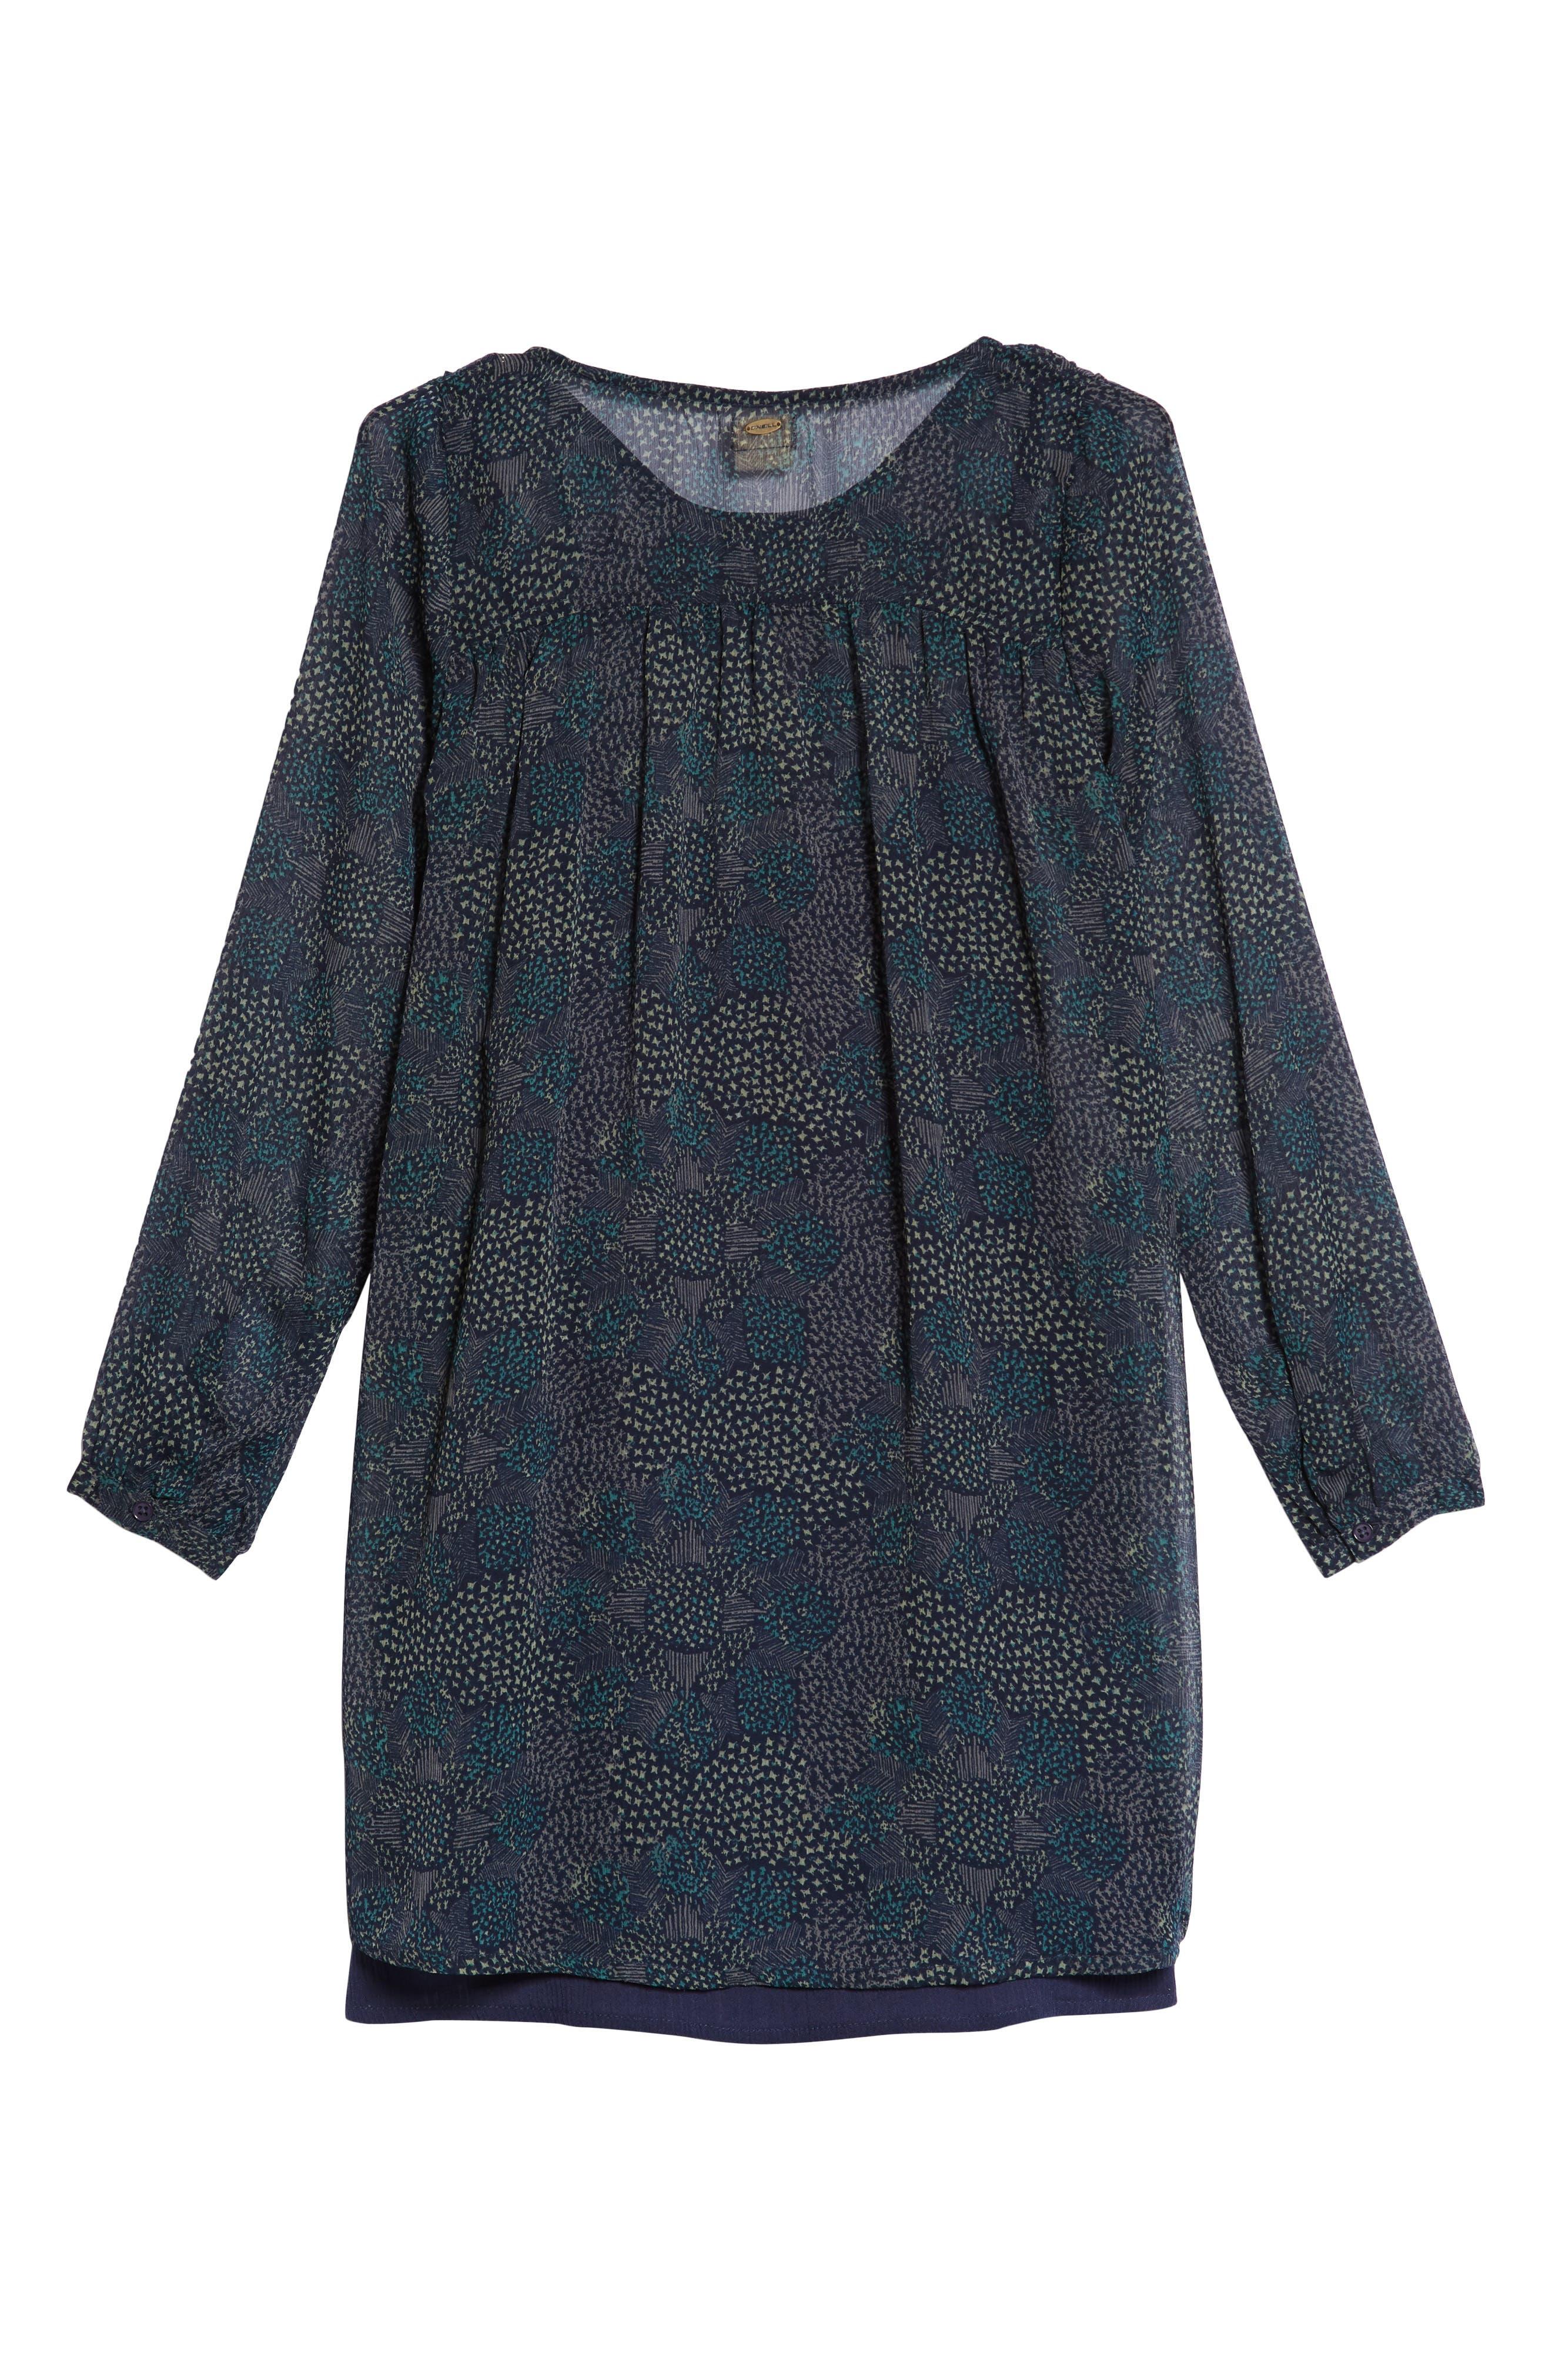 Summer Layered Dress,                             Alternate thumbnail 2, color,                             MOOD INDIGO